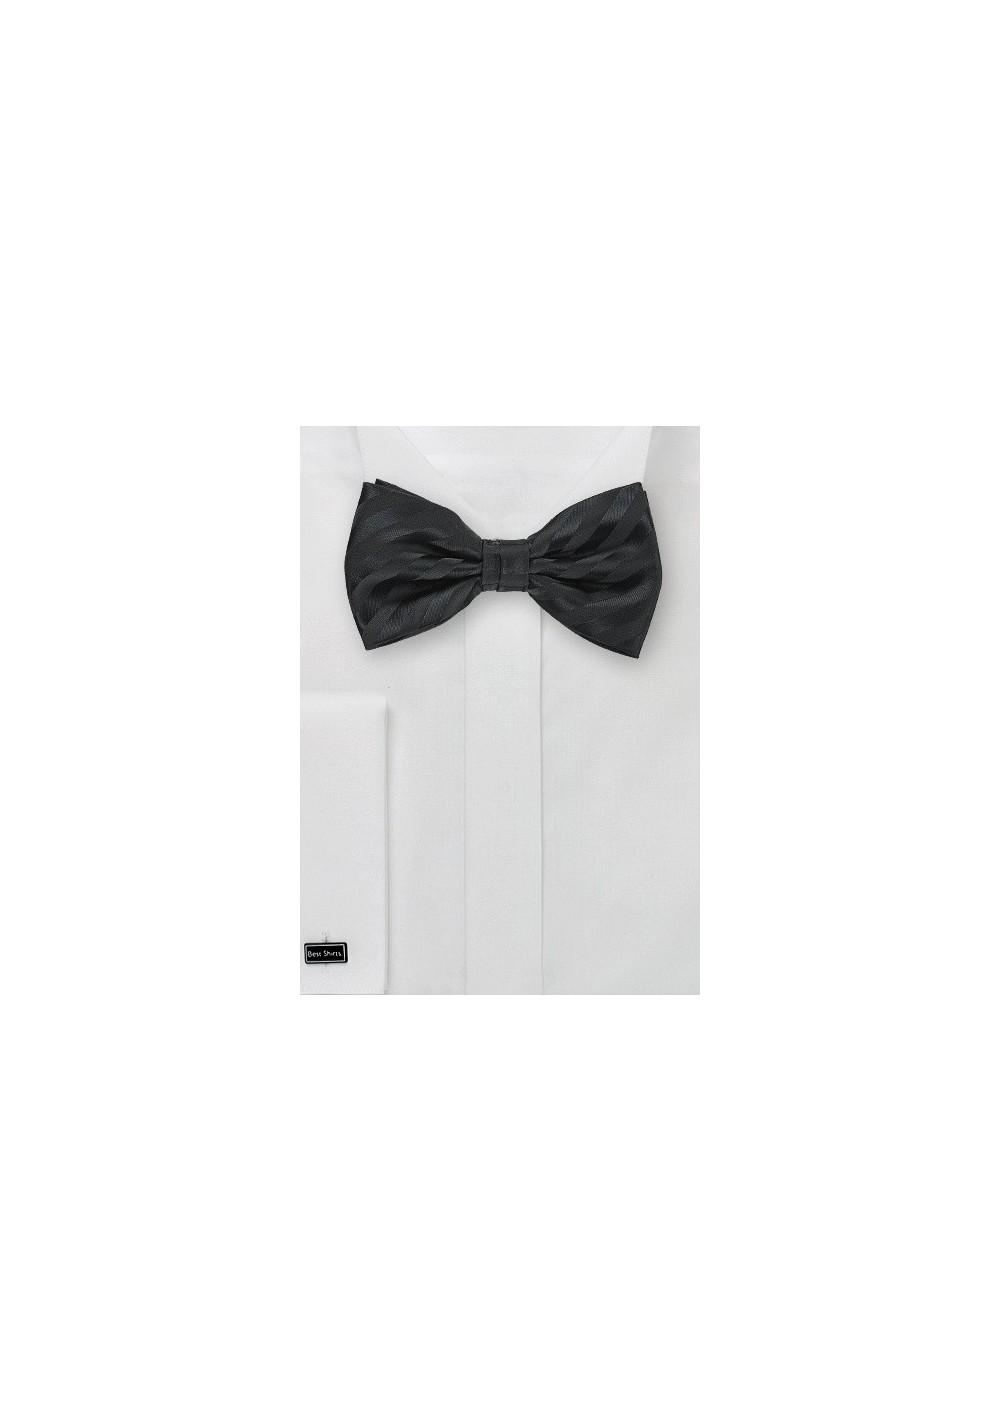 Formal Black Striped Bow Tie for Kids